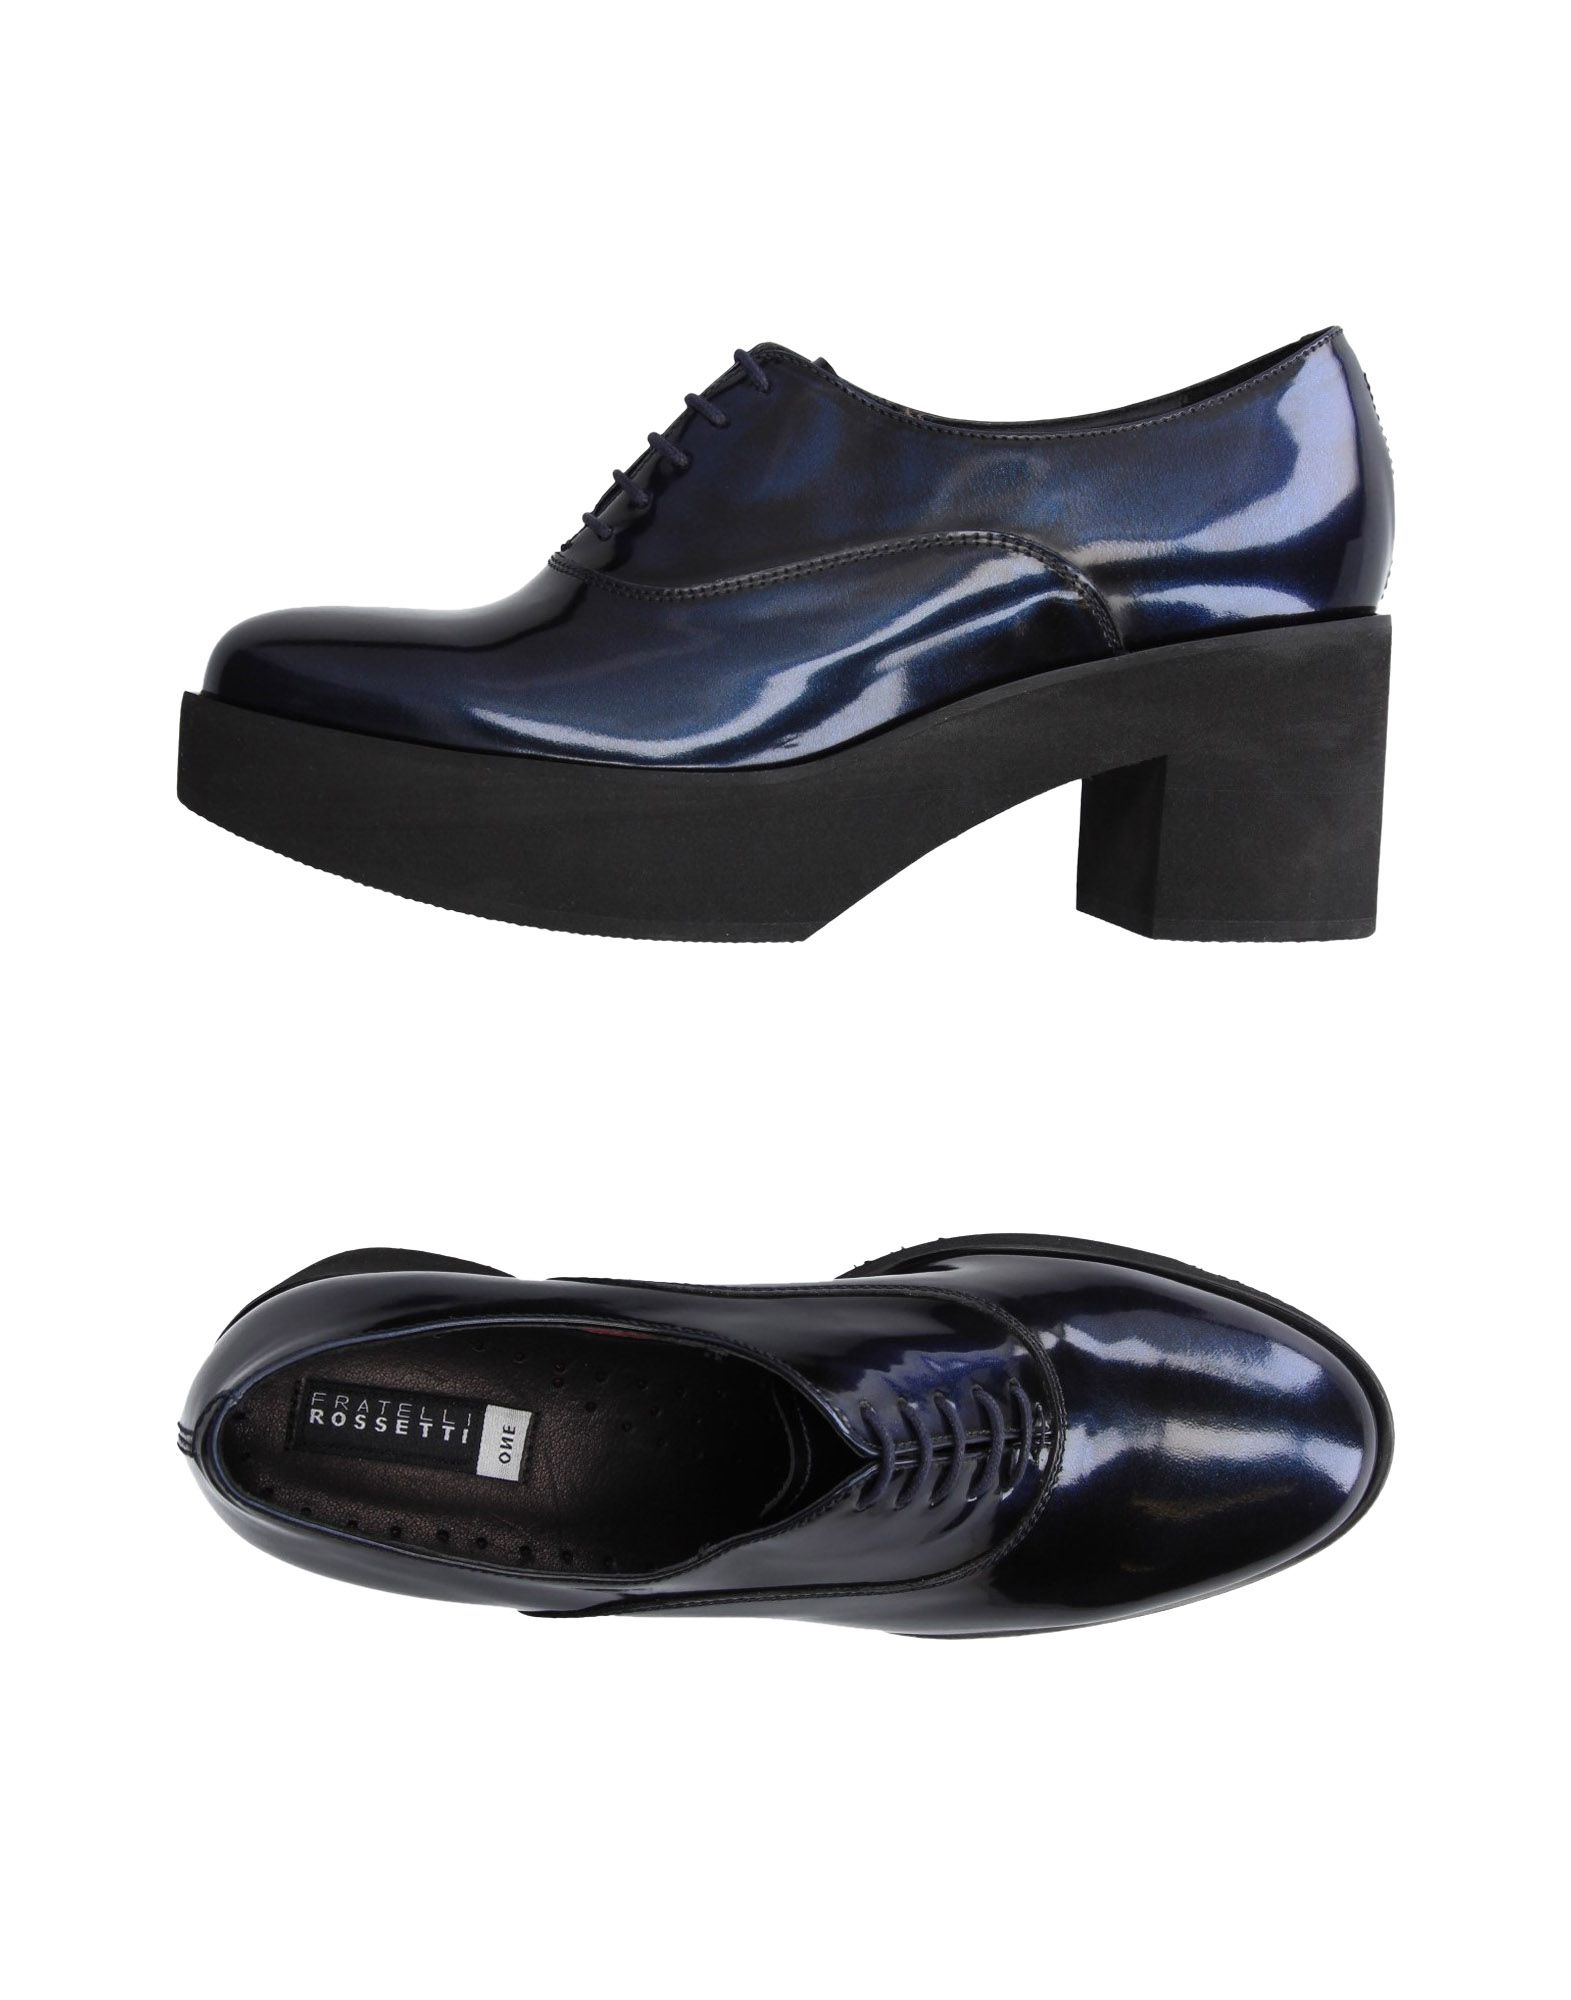 Fratelli Rossetti Schnürschuhe Damen strapazierfähige  11219351FOGut aussehende strapazierfähige Damen Schuhe 6a2f31